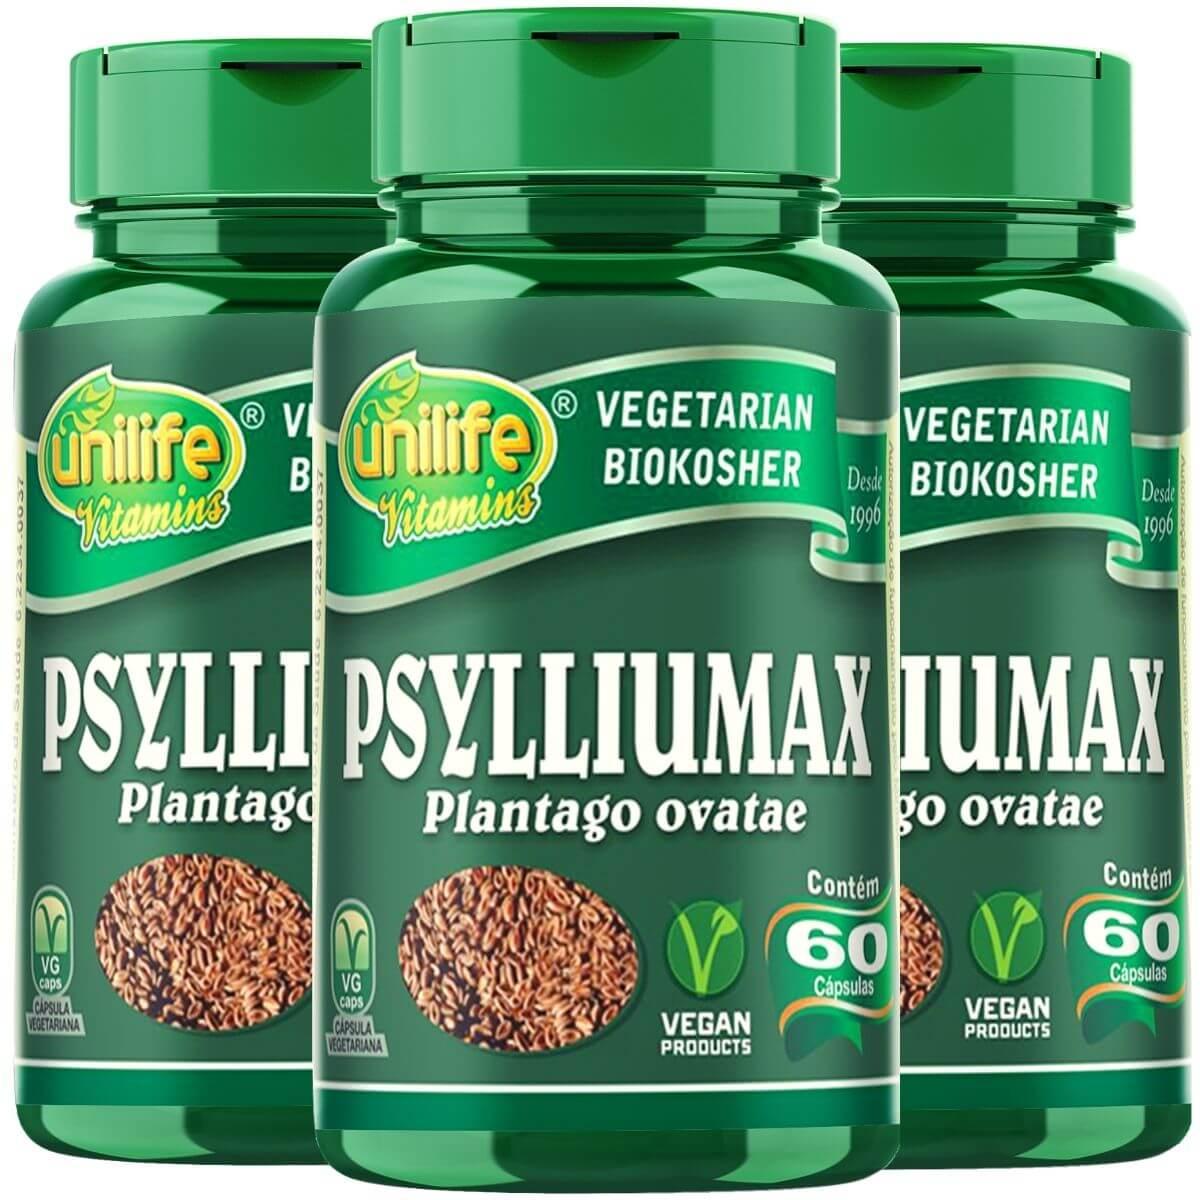 Kit 3 Psylliumax - Psyllium 550mg 60 Cápsulas - Unilife